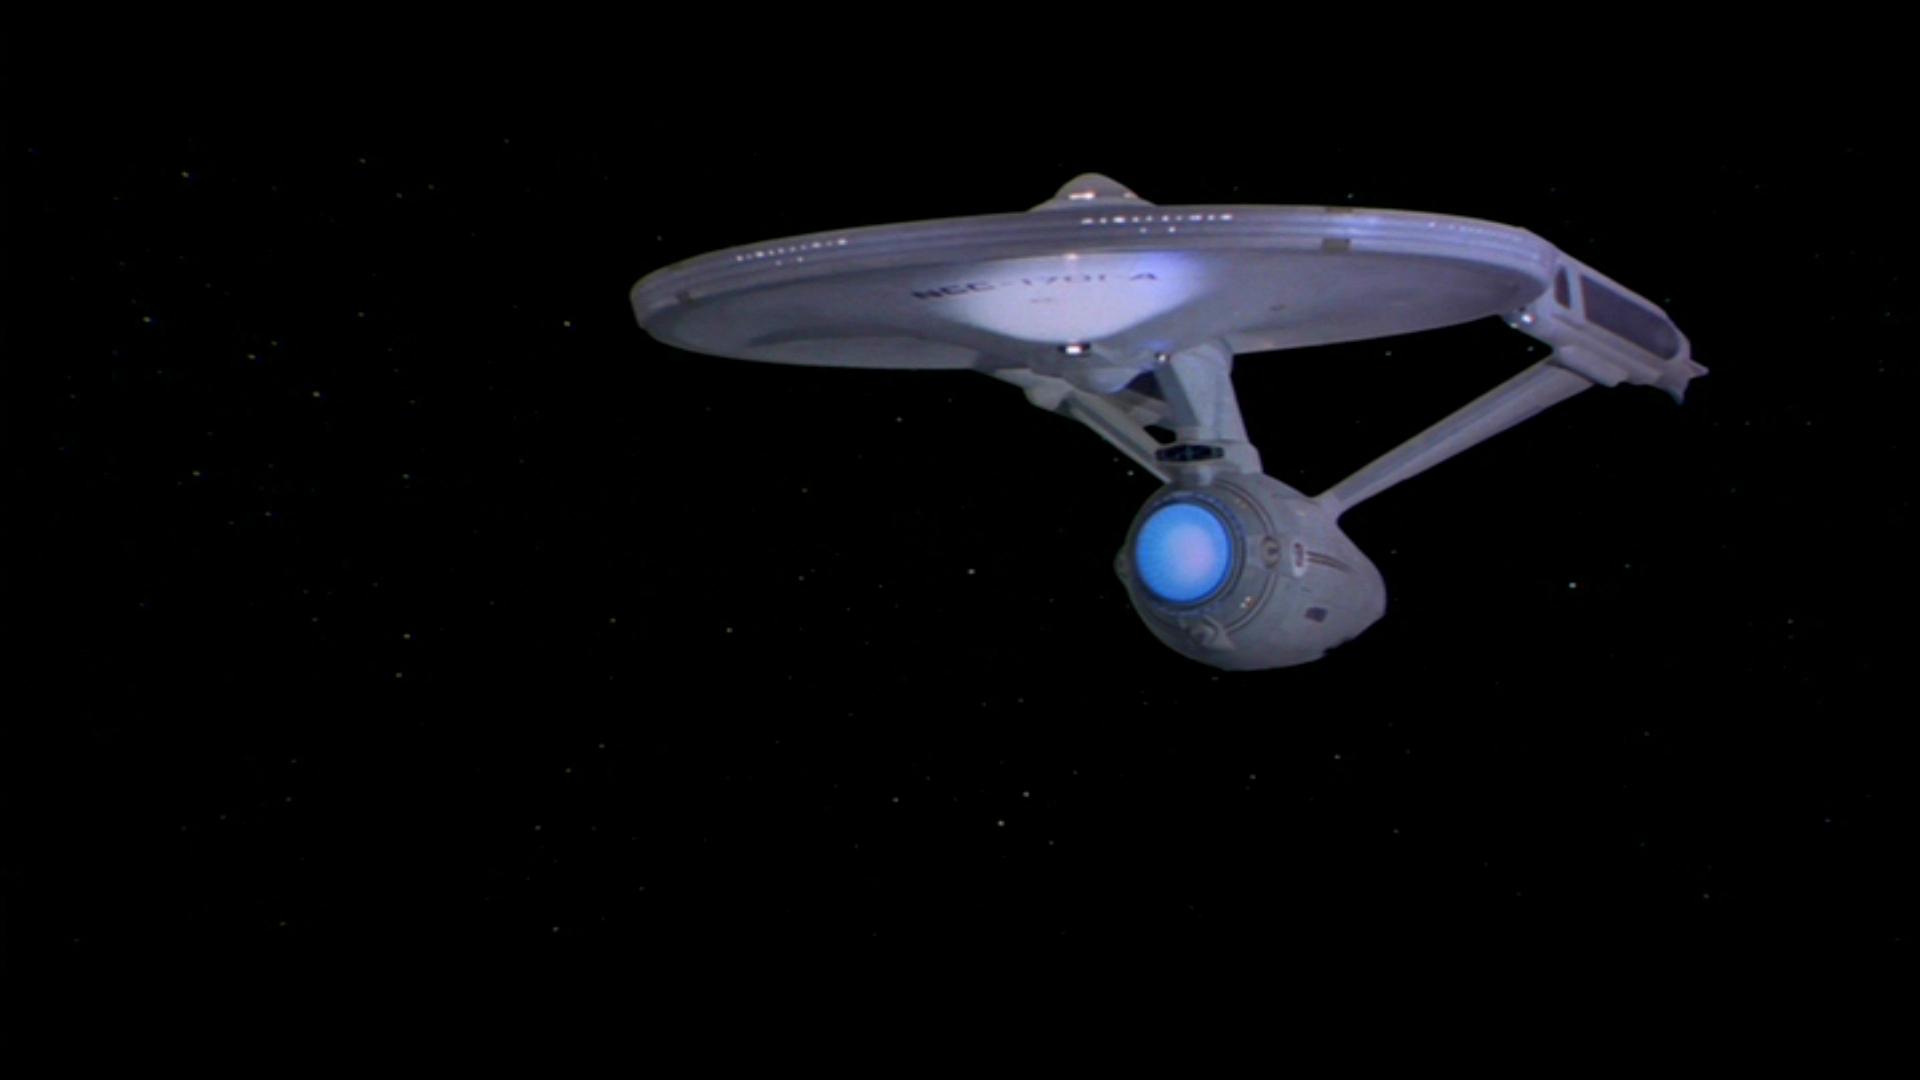 Wallpaper Abyss Explore the Collection Star Trek Movie Star Trek 1920x1080